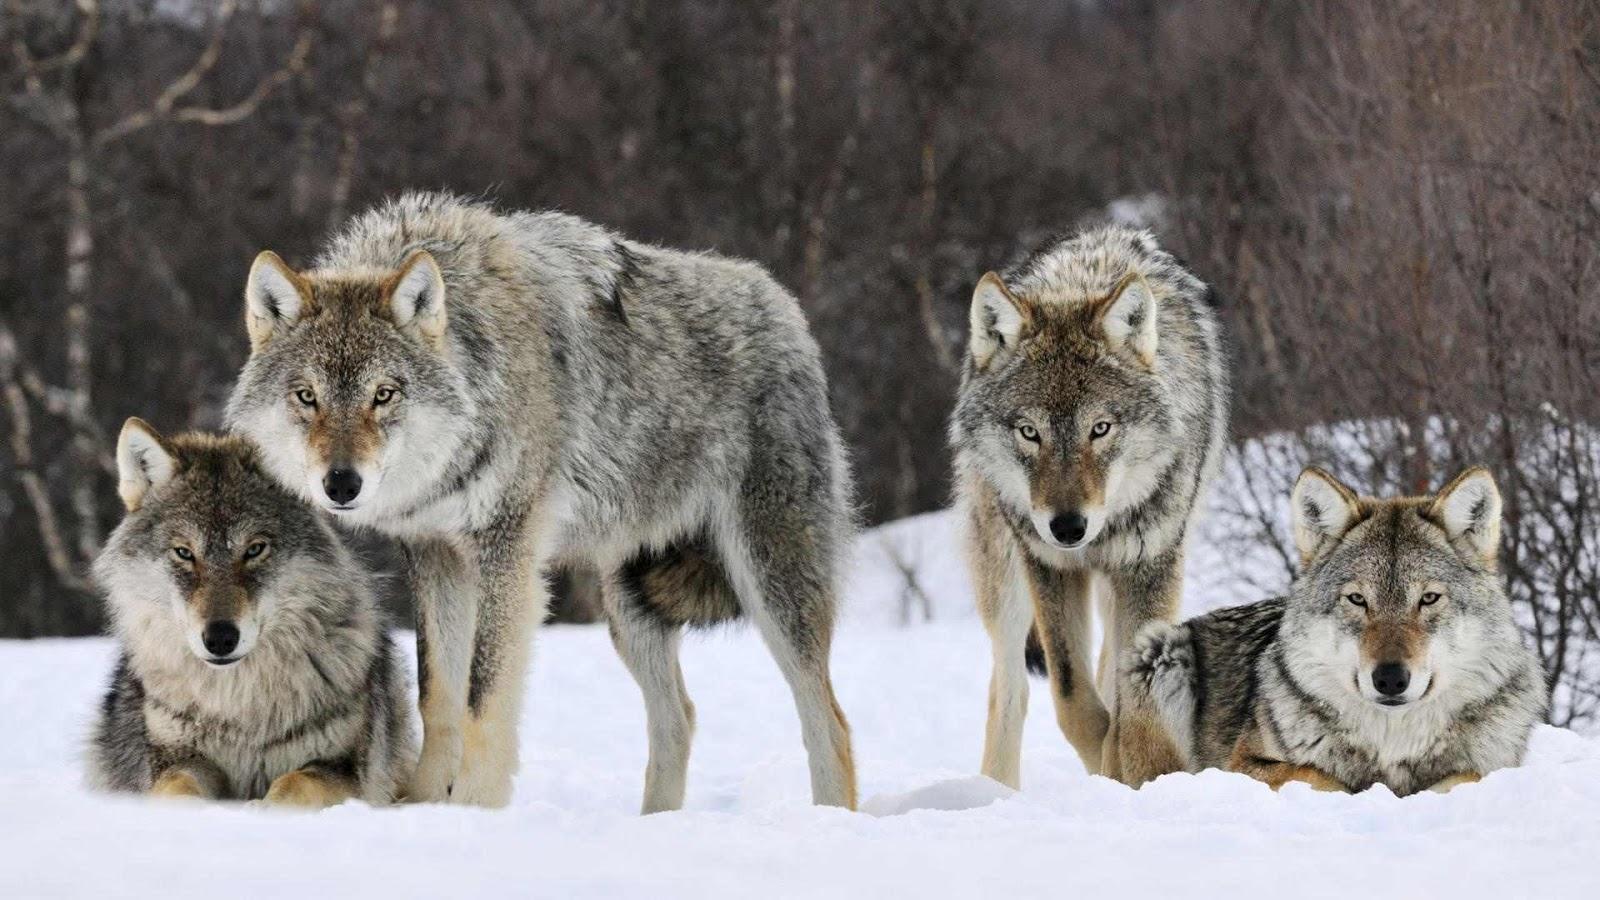 yi wei lim, yiweilim, yiwei lim, bourne, wolf, wolfpack, wolf pack, wolves